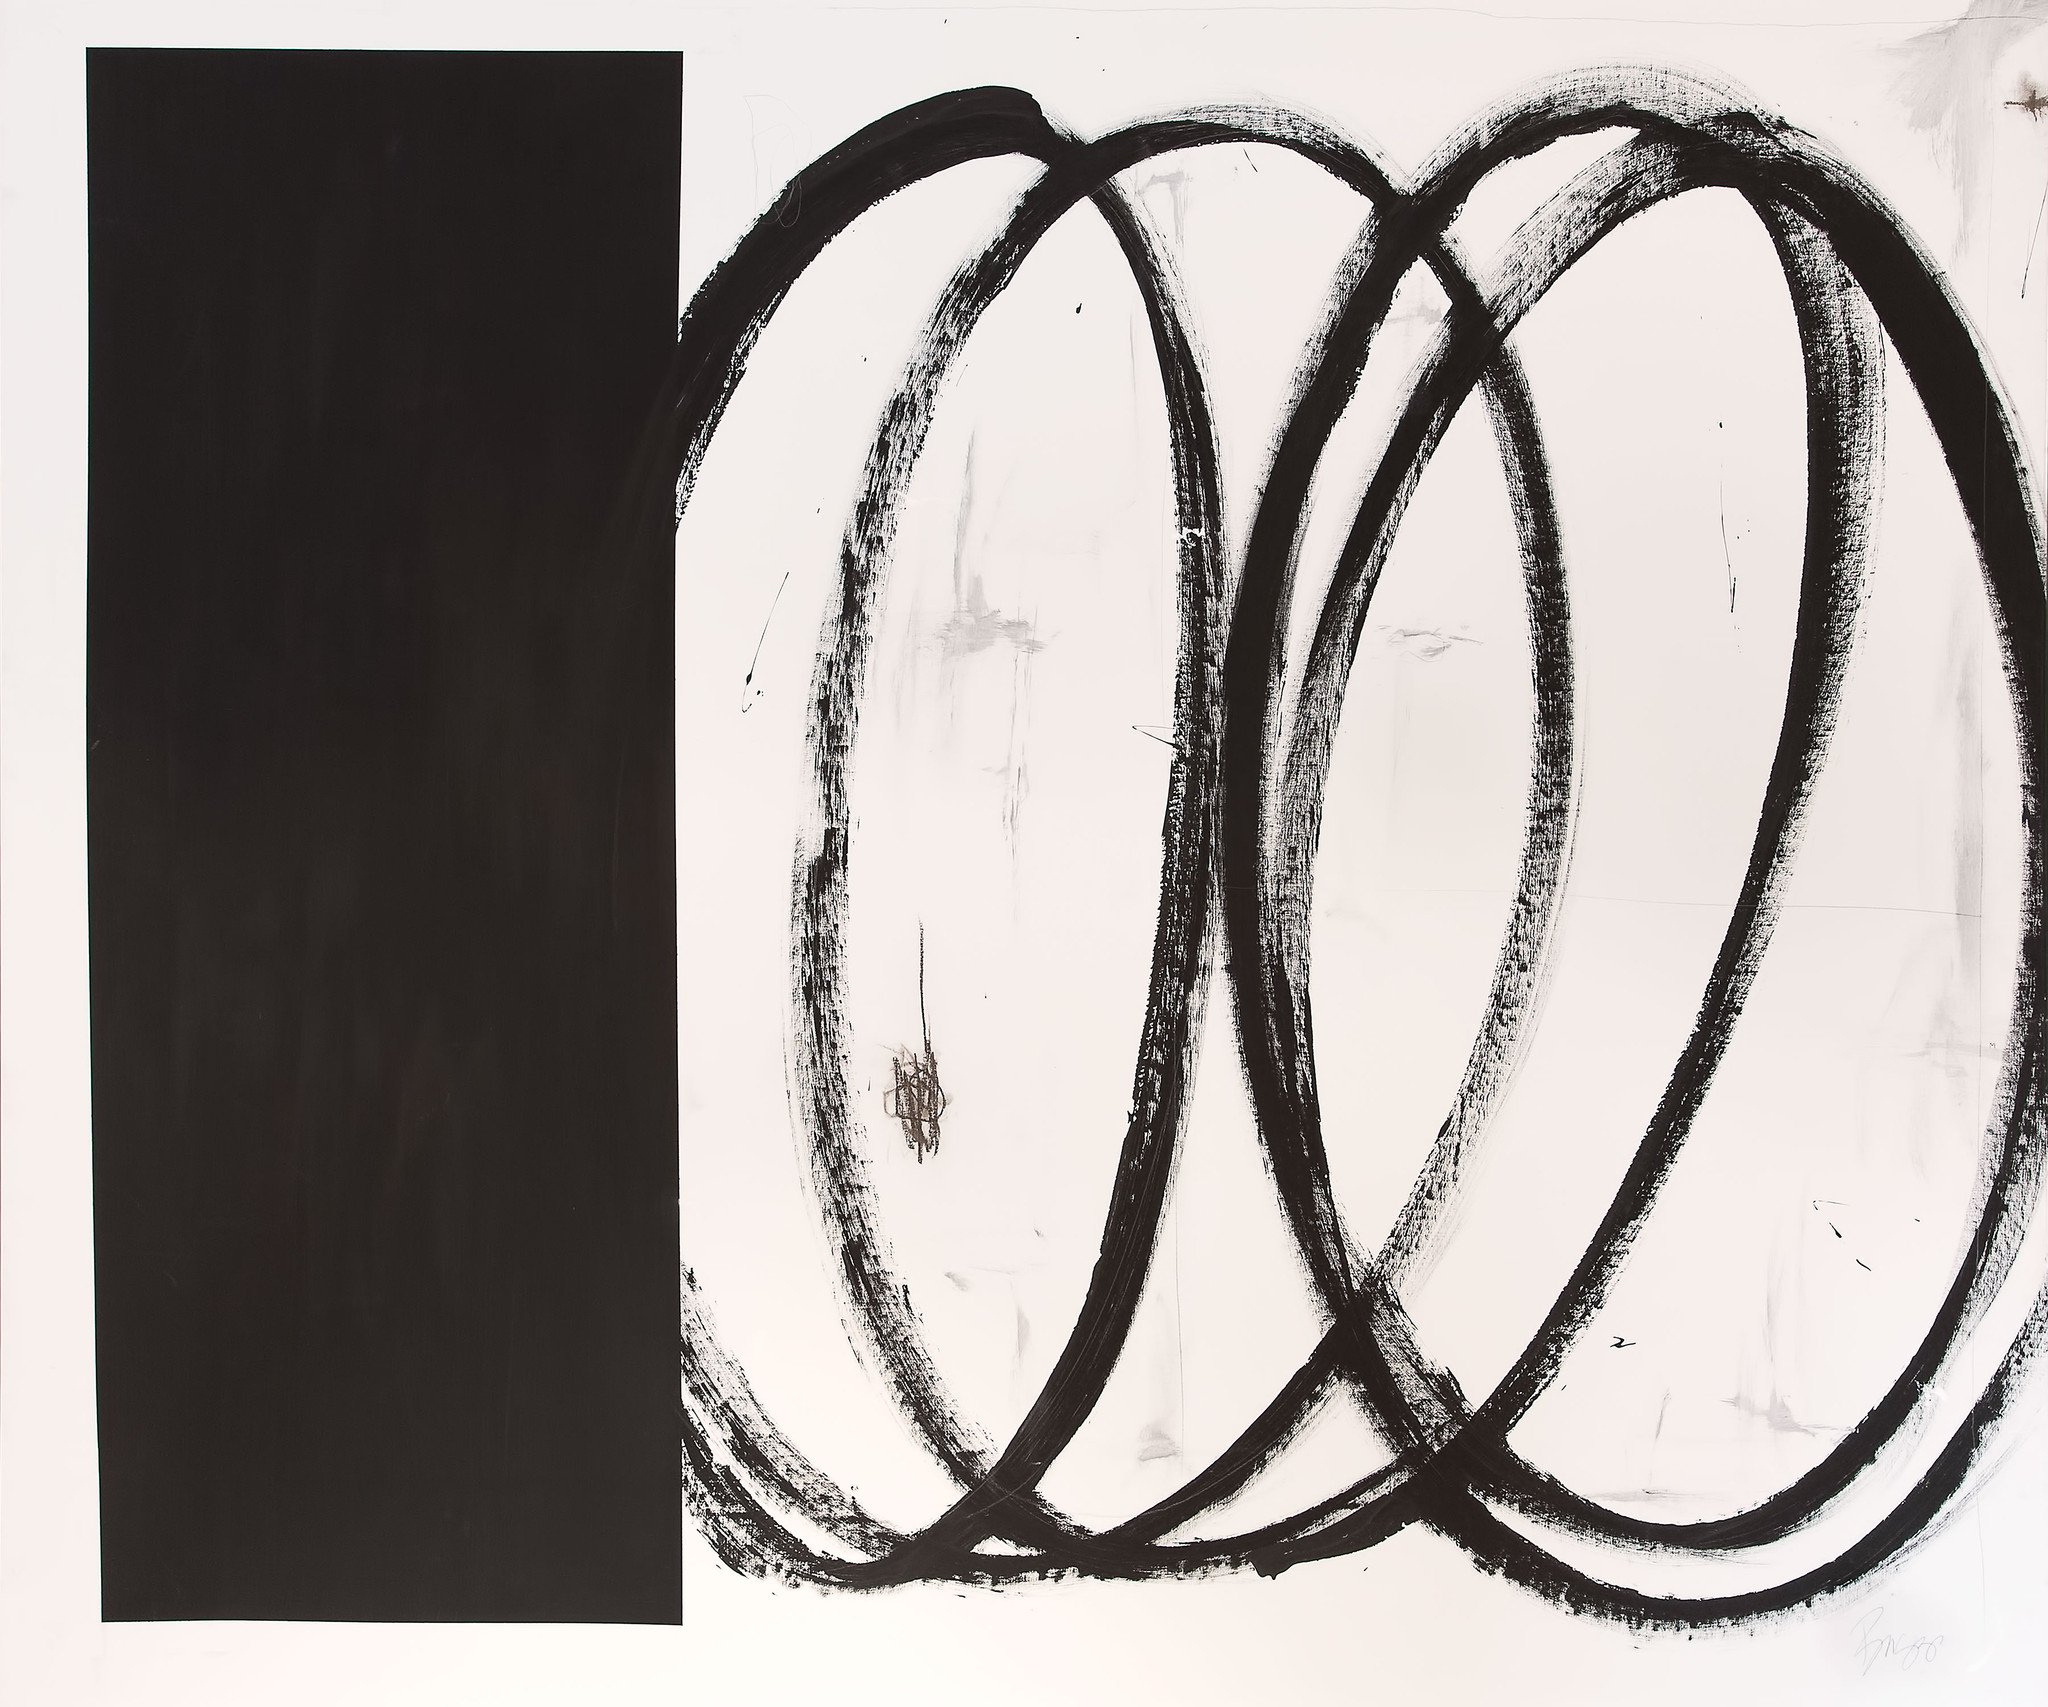 Briggs Solomon Black Square With Swirls – ArtStar